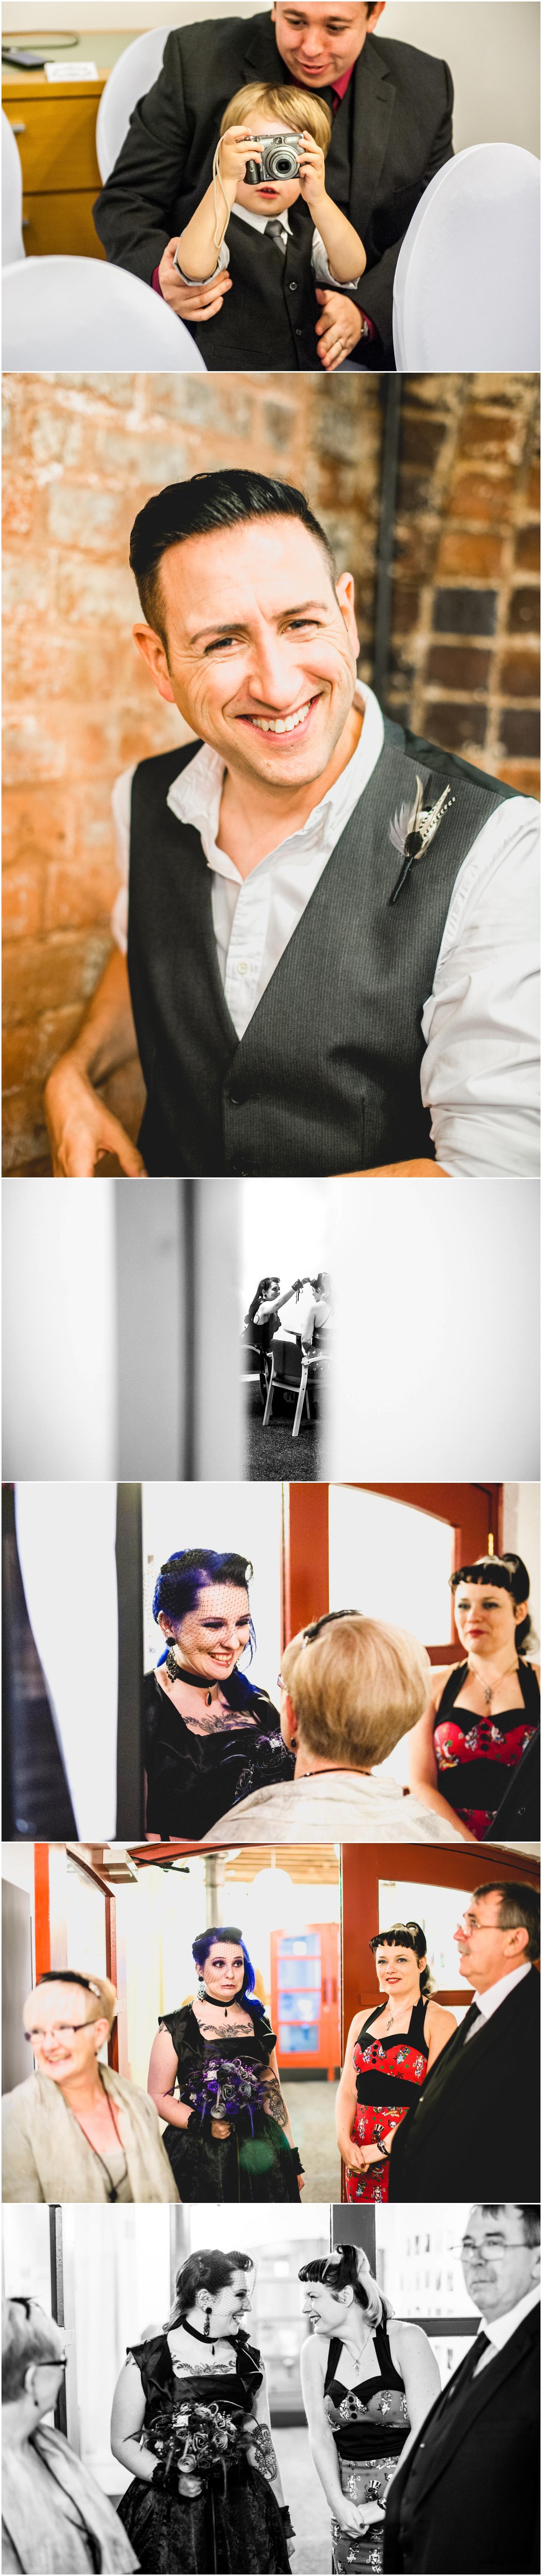 Bond Company Wedding, Digbeth, Lisa Carpenter Photography, Birmingham, goth wedding, alternative wedding, photos, ceremony